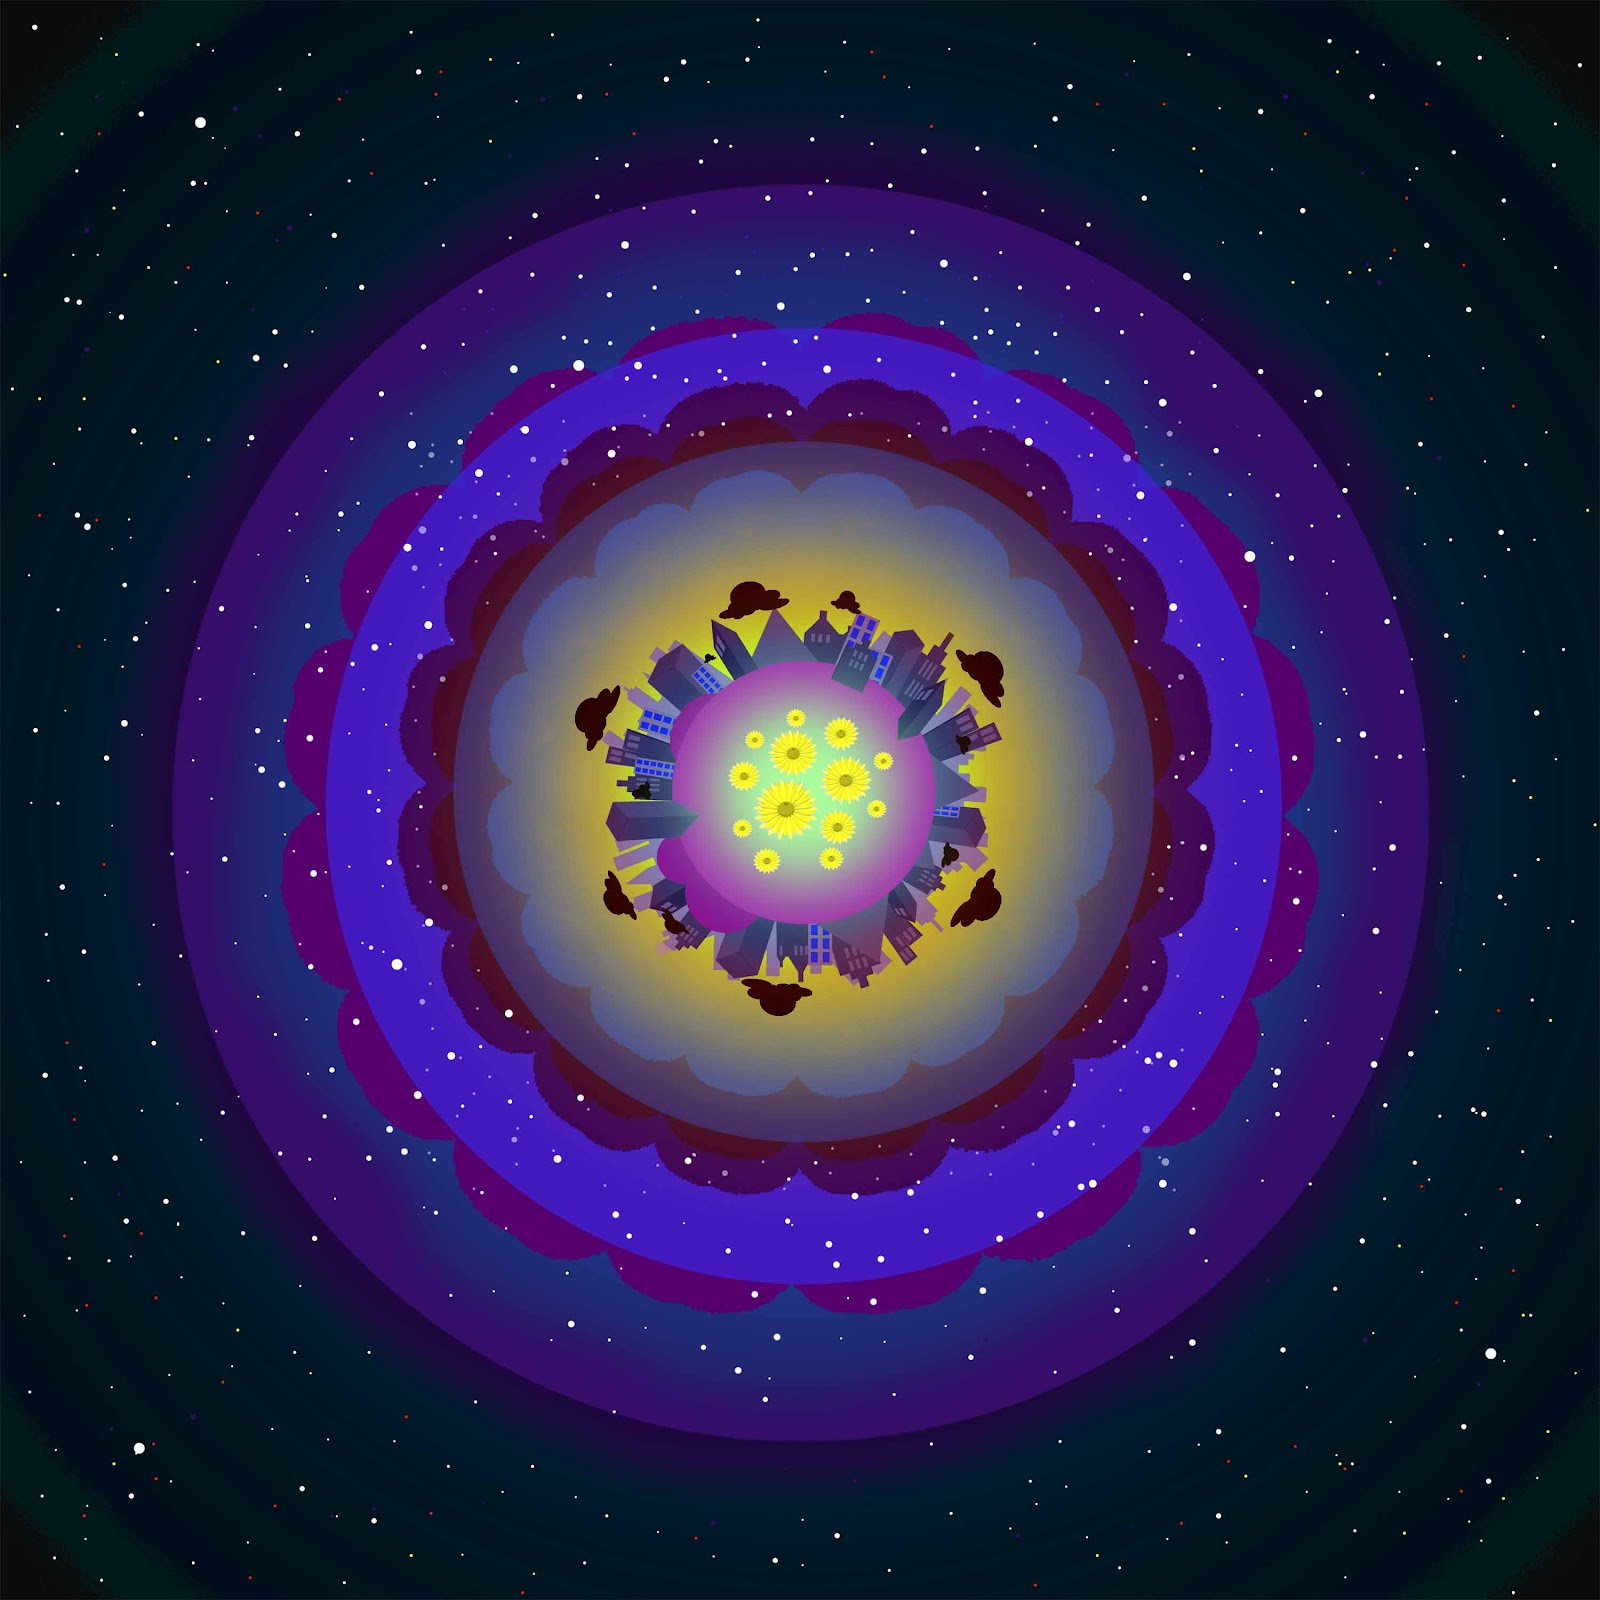 planets animation - photo #10